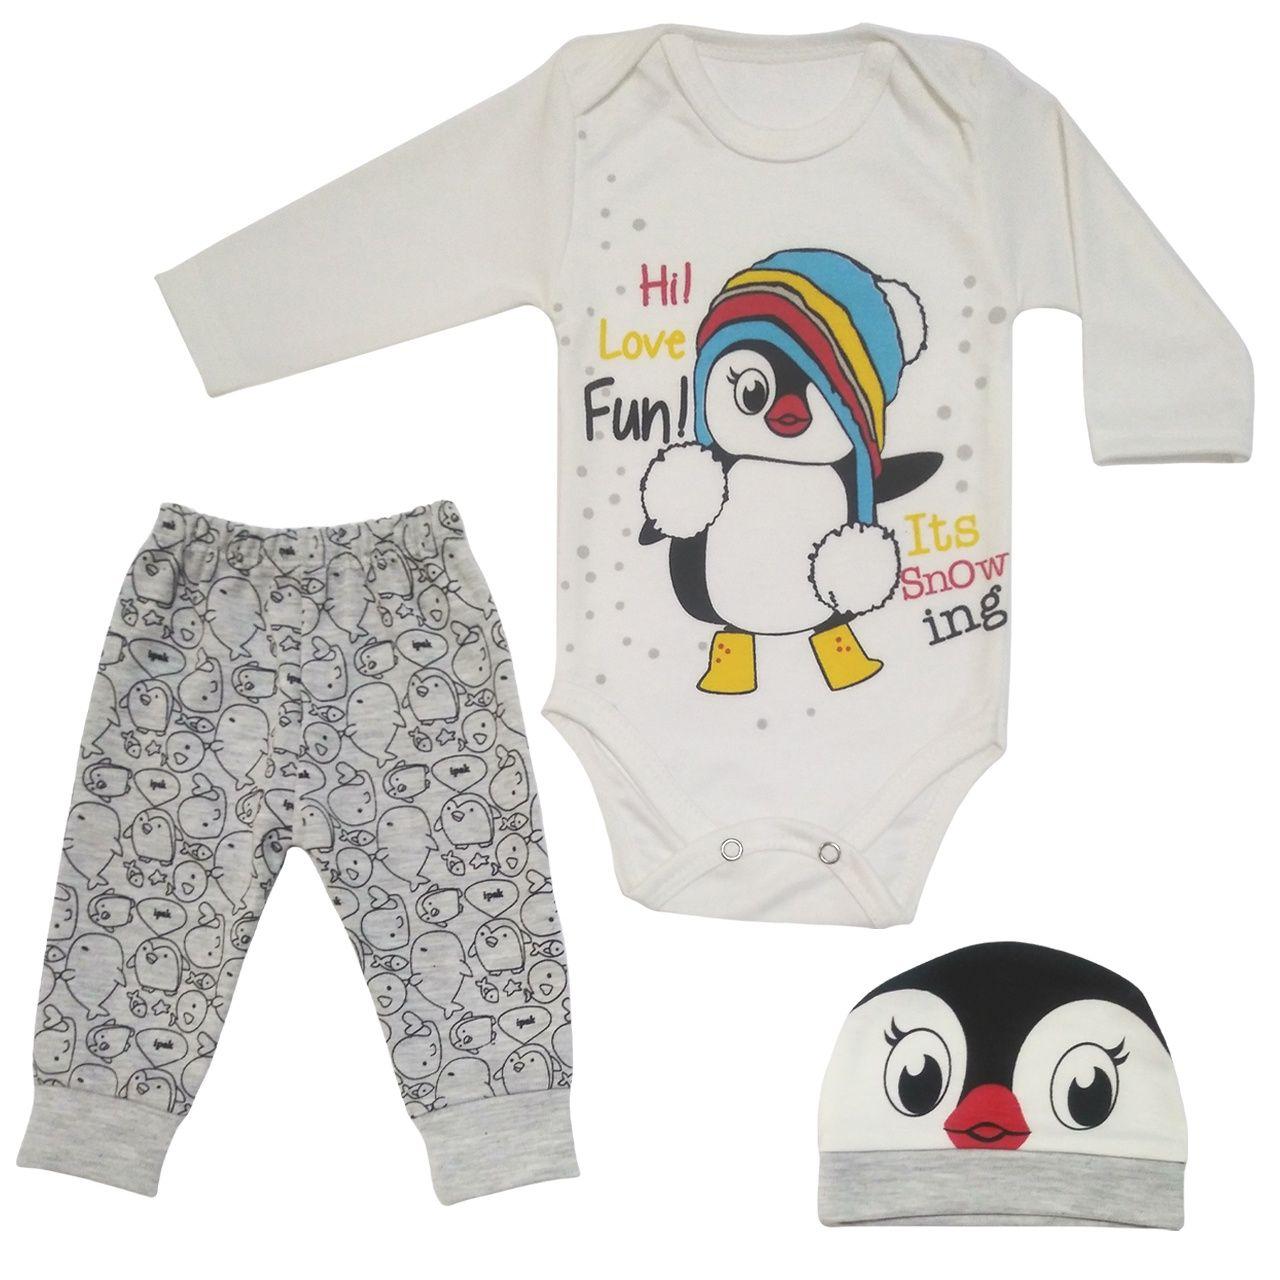 ست 3 تکه لباس نوزادی طرح پنگوئن کد M132 -  - 2